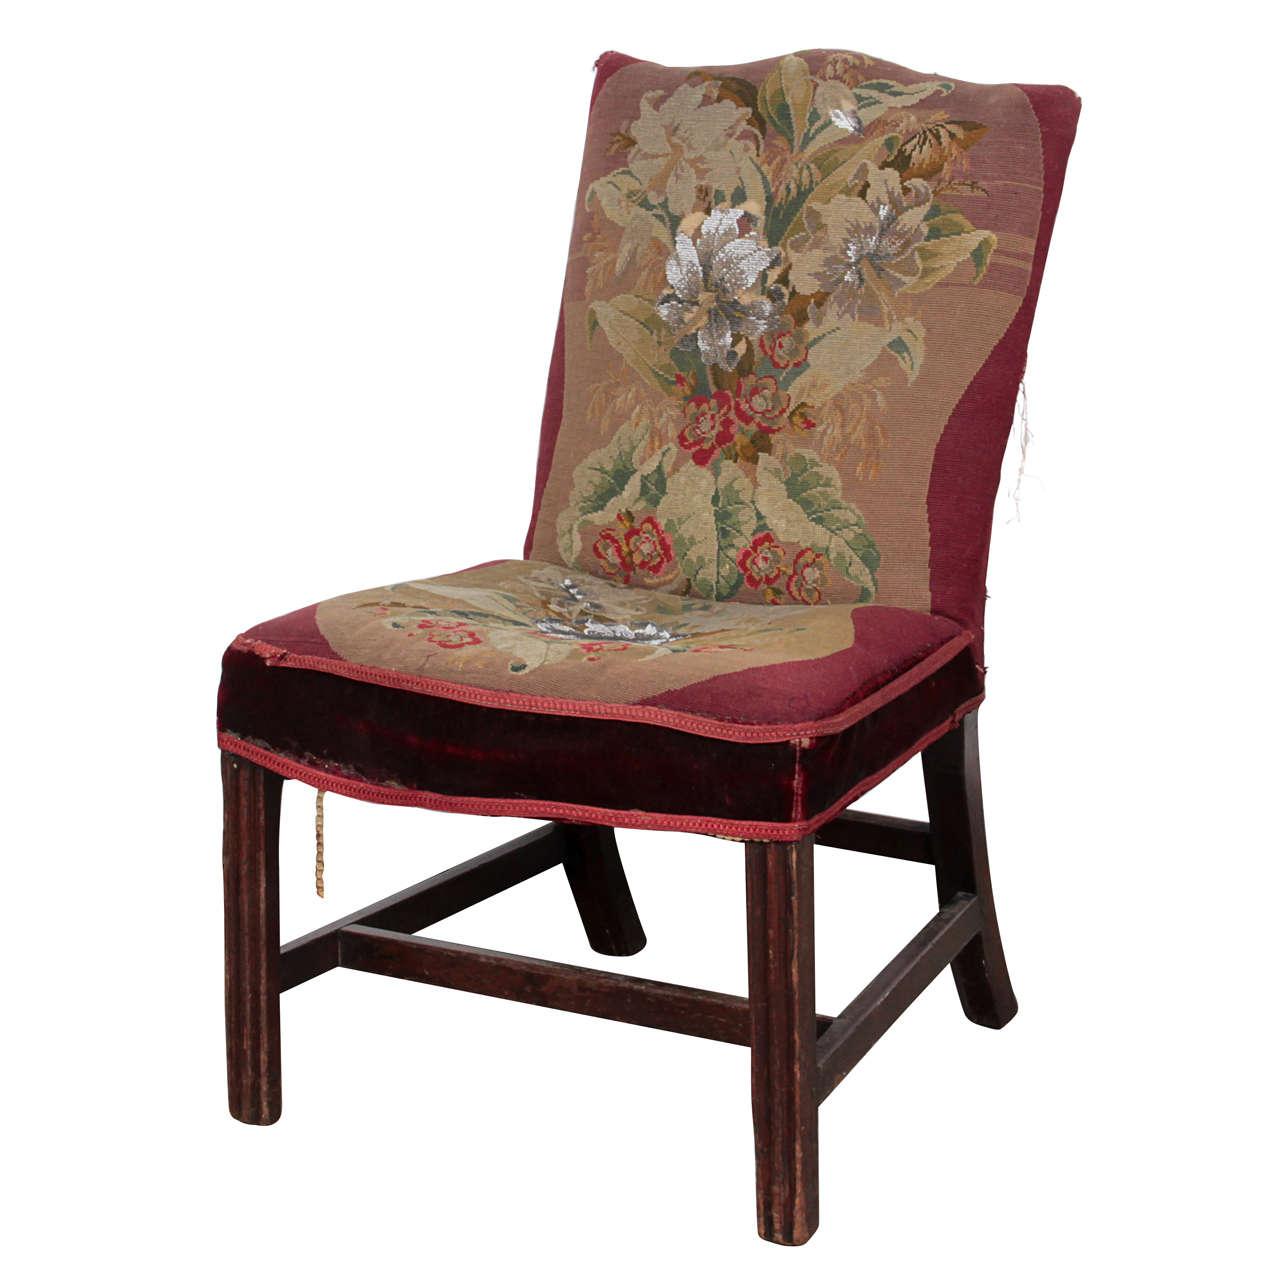 19th Century Handmade Needlepoint Side Chair